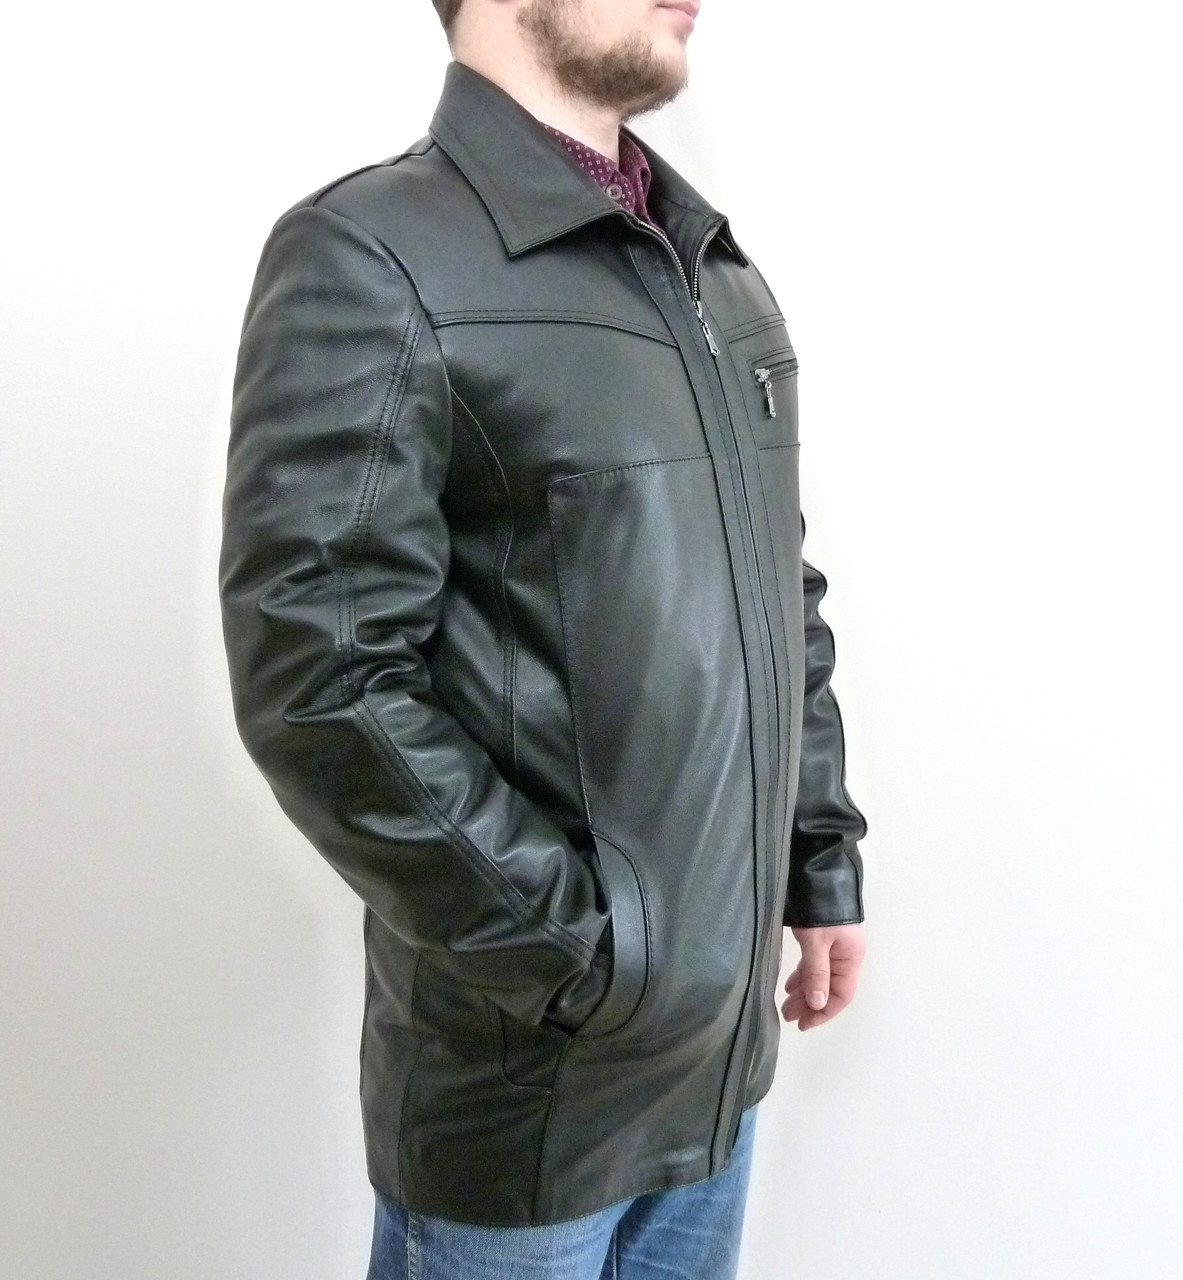 Кожаная мужская куртка KONDOR+ размер L